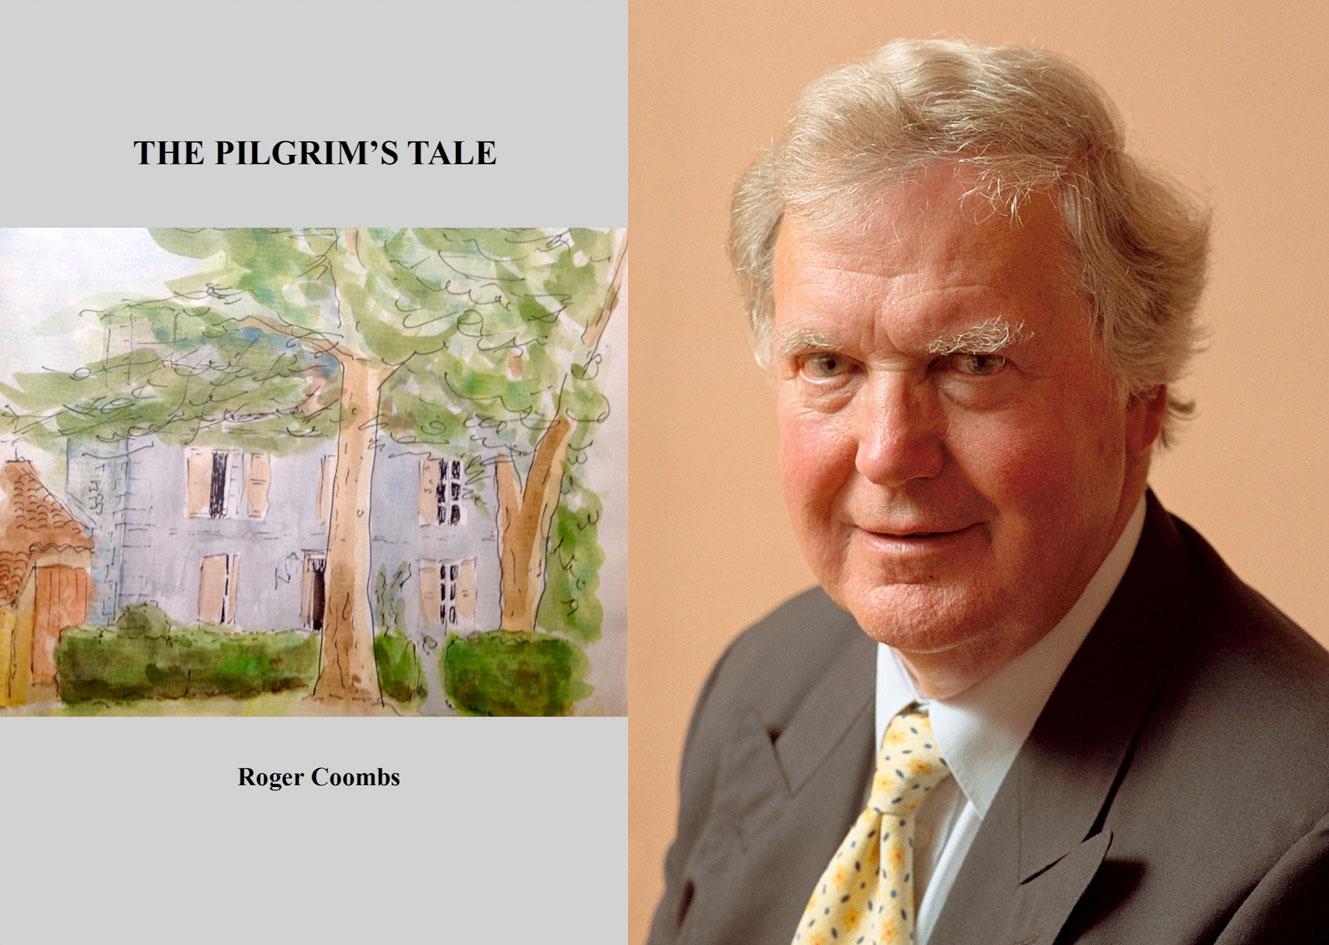 The Pilgrim's Tale